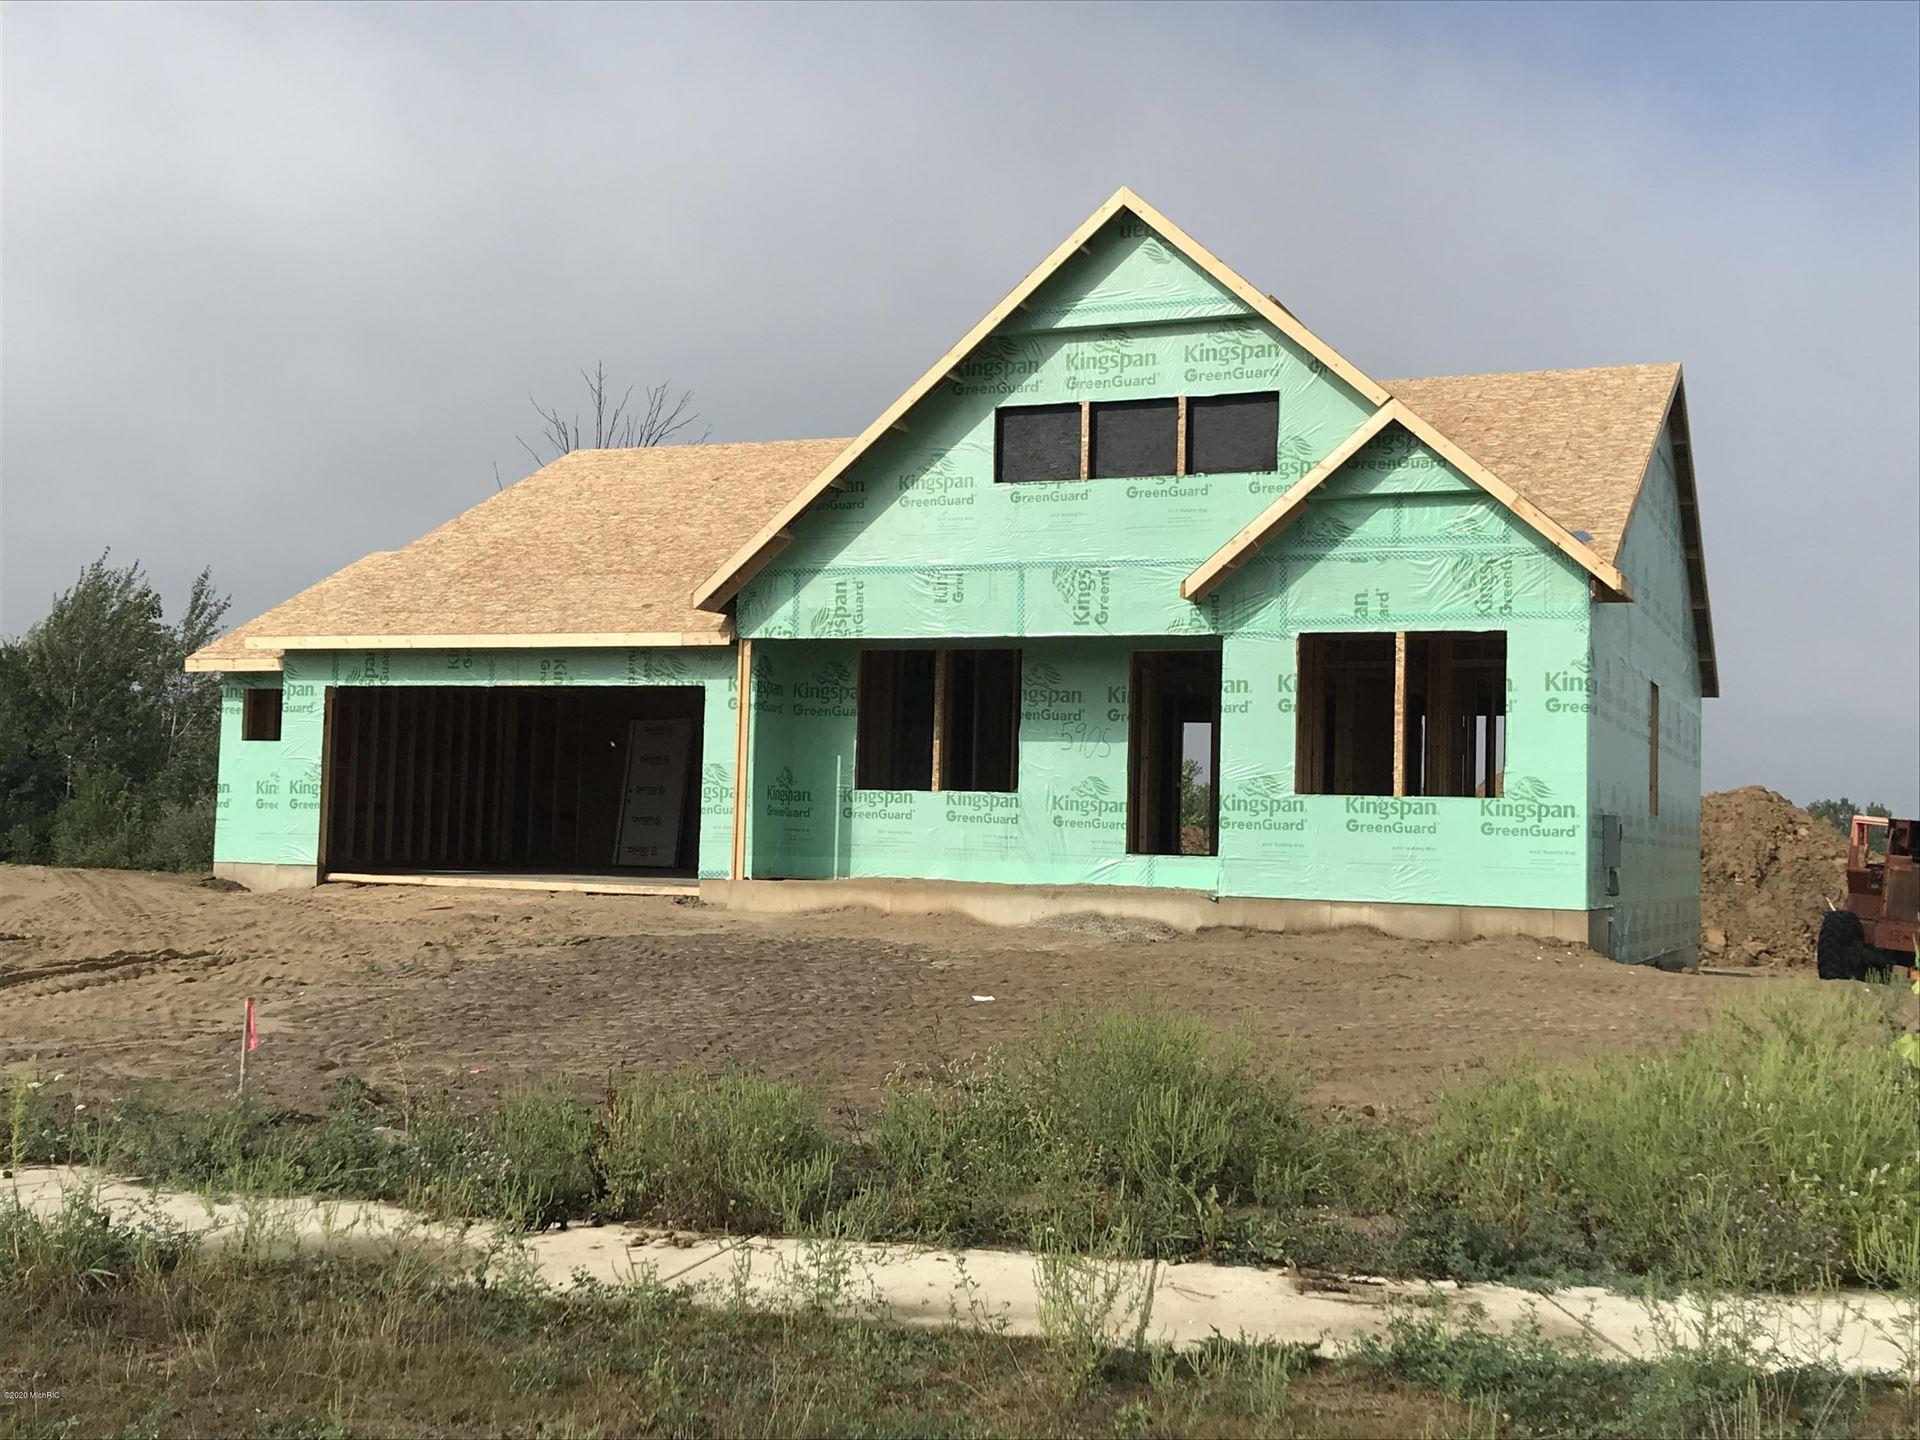 Lot 164 Amur Court SW, Wyoming, MI 49418 - MLS#: 20014096